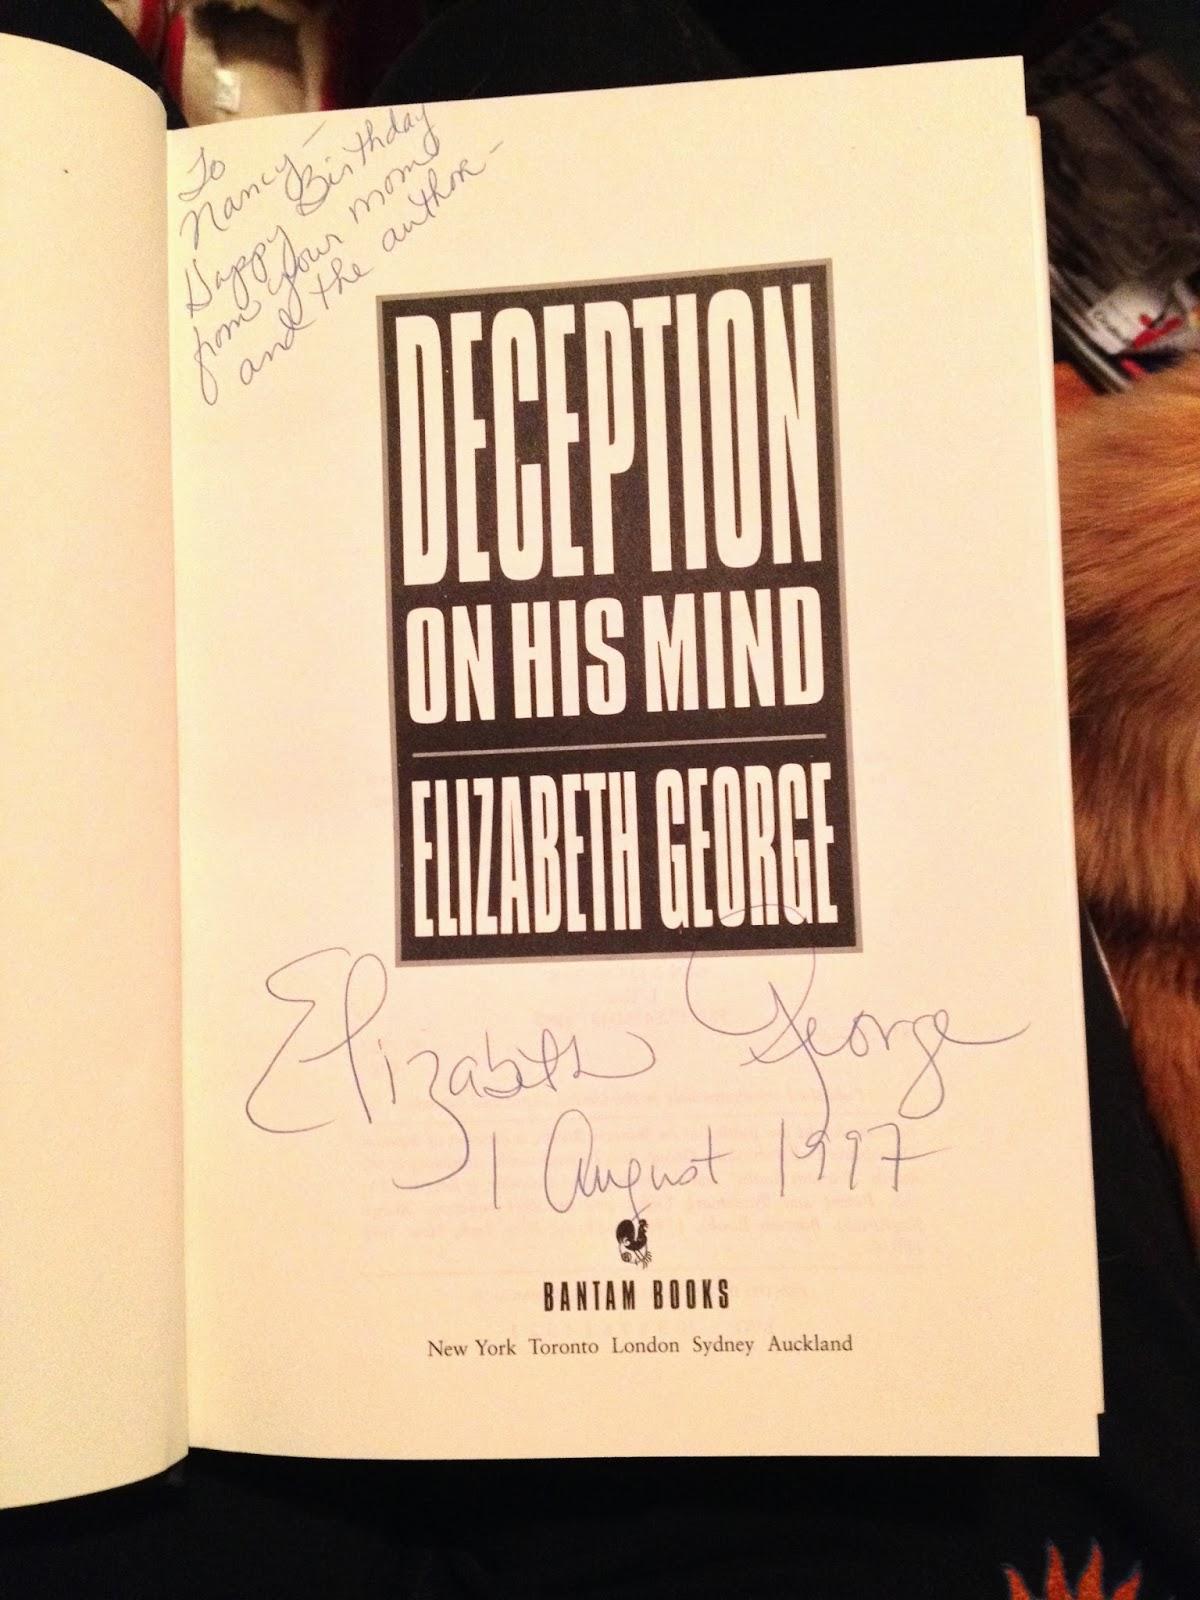 elizabeth george books